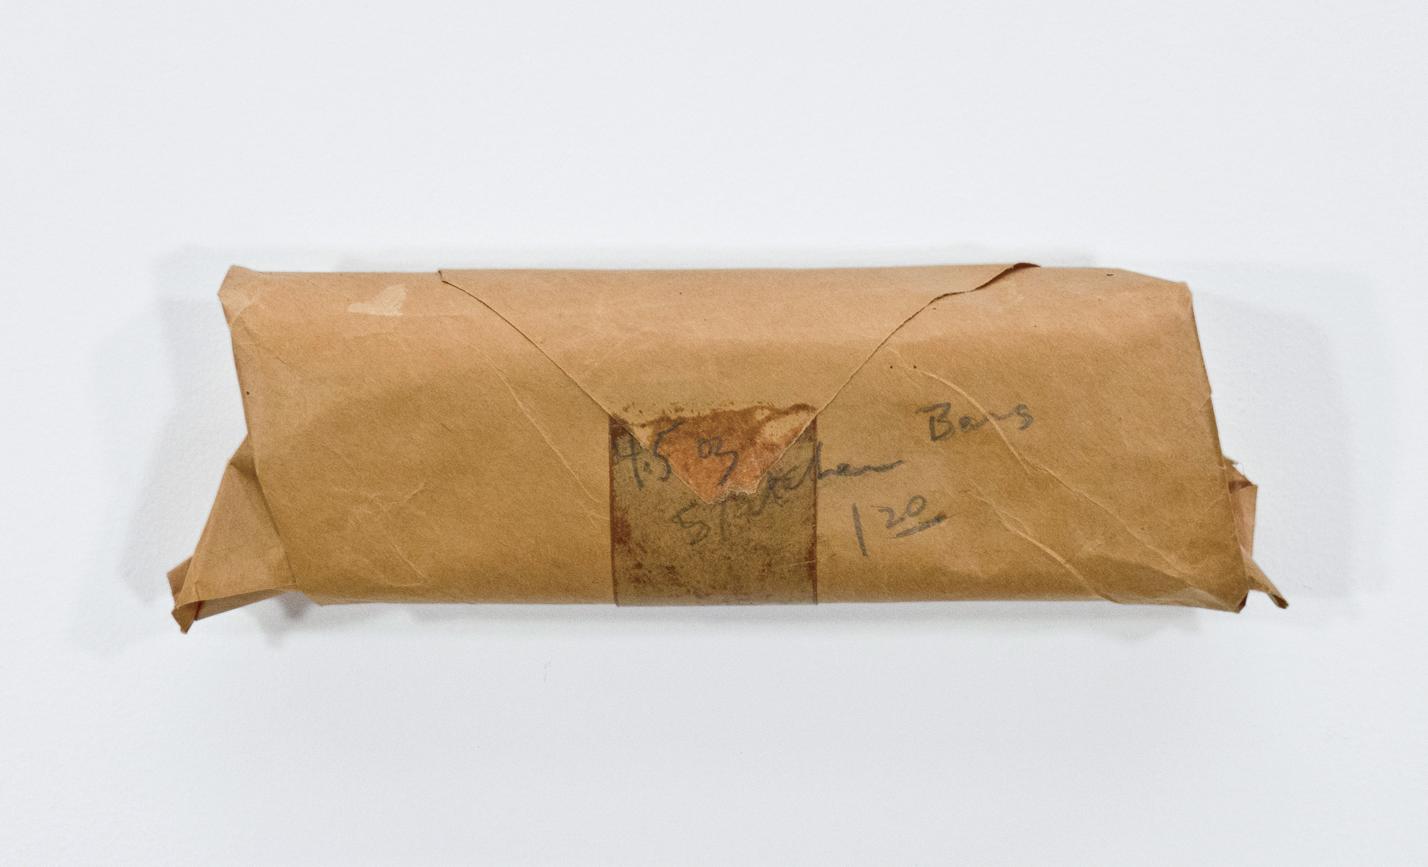 "4.5oz Stretcher Bars; stretcher bars, packing paper and graphite; 10 ½ x 3 x 1 3/8"""